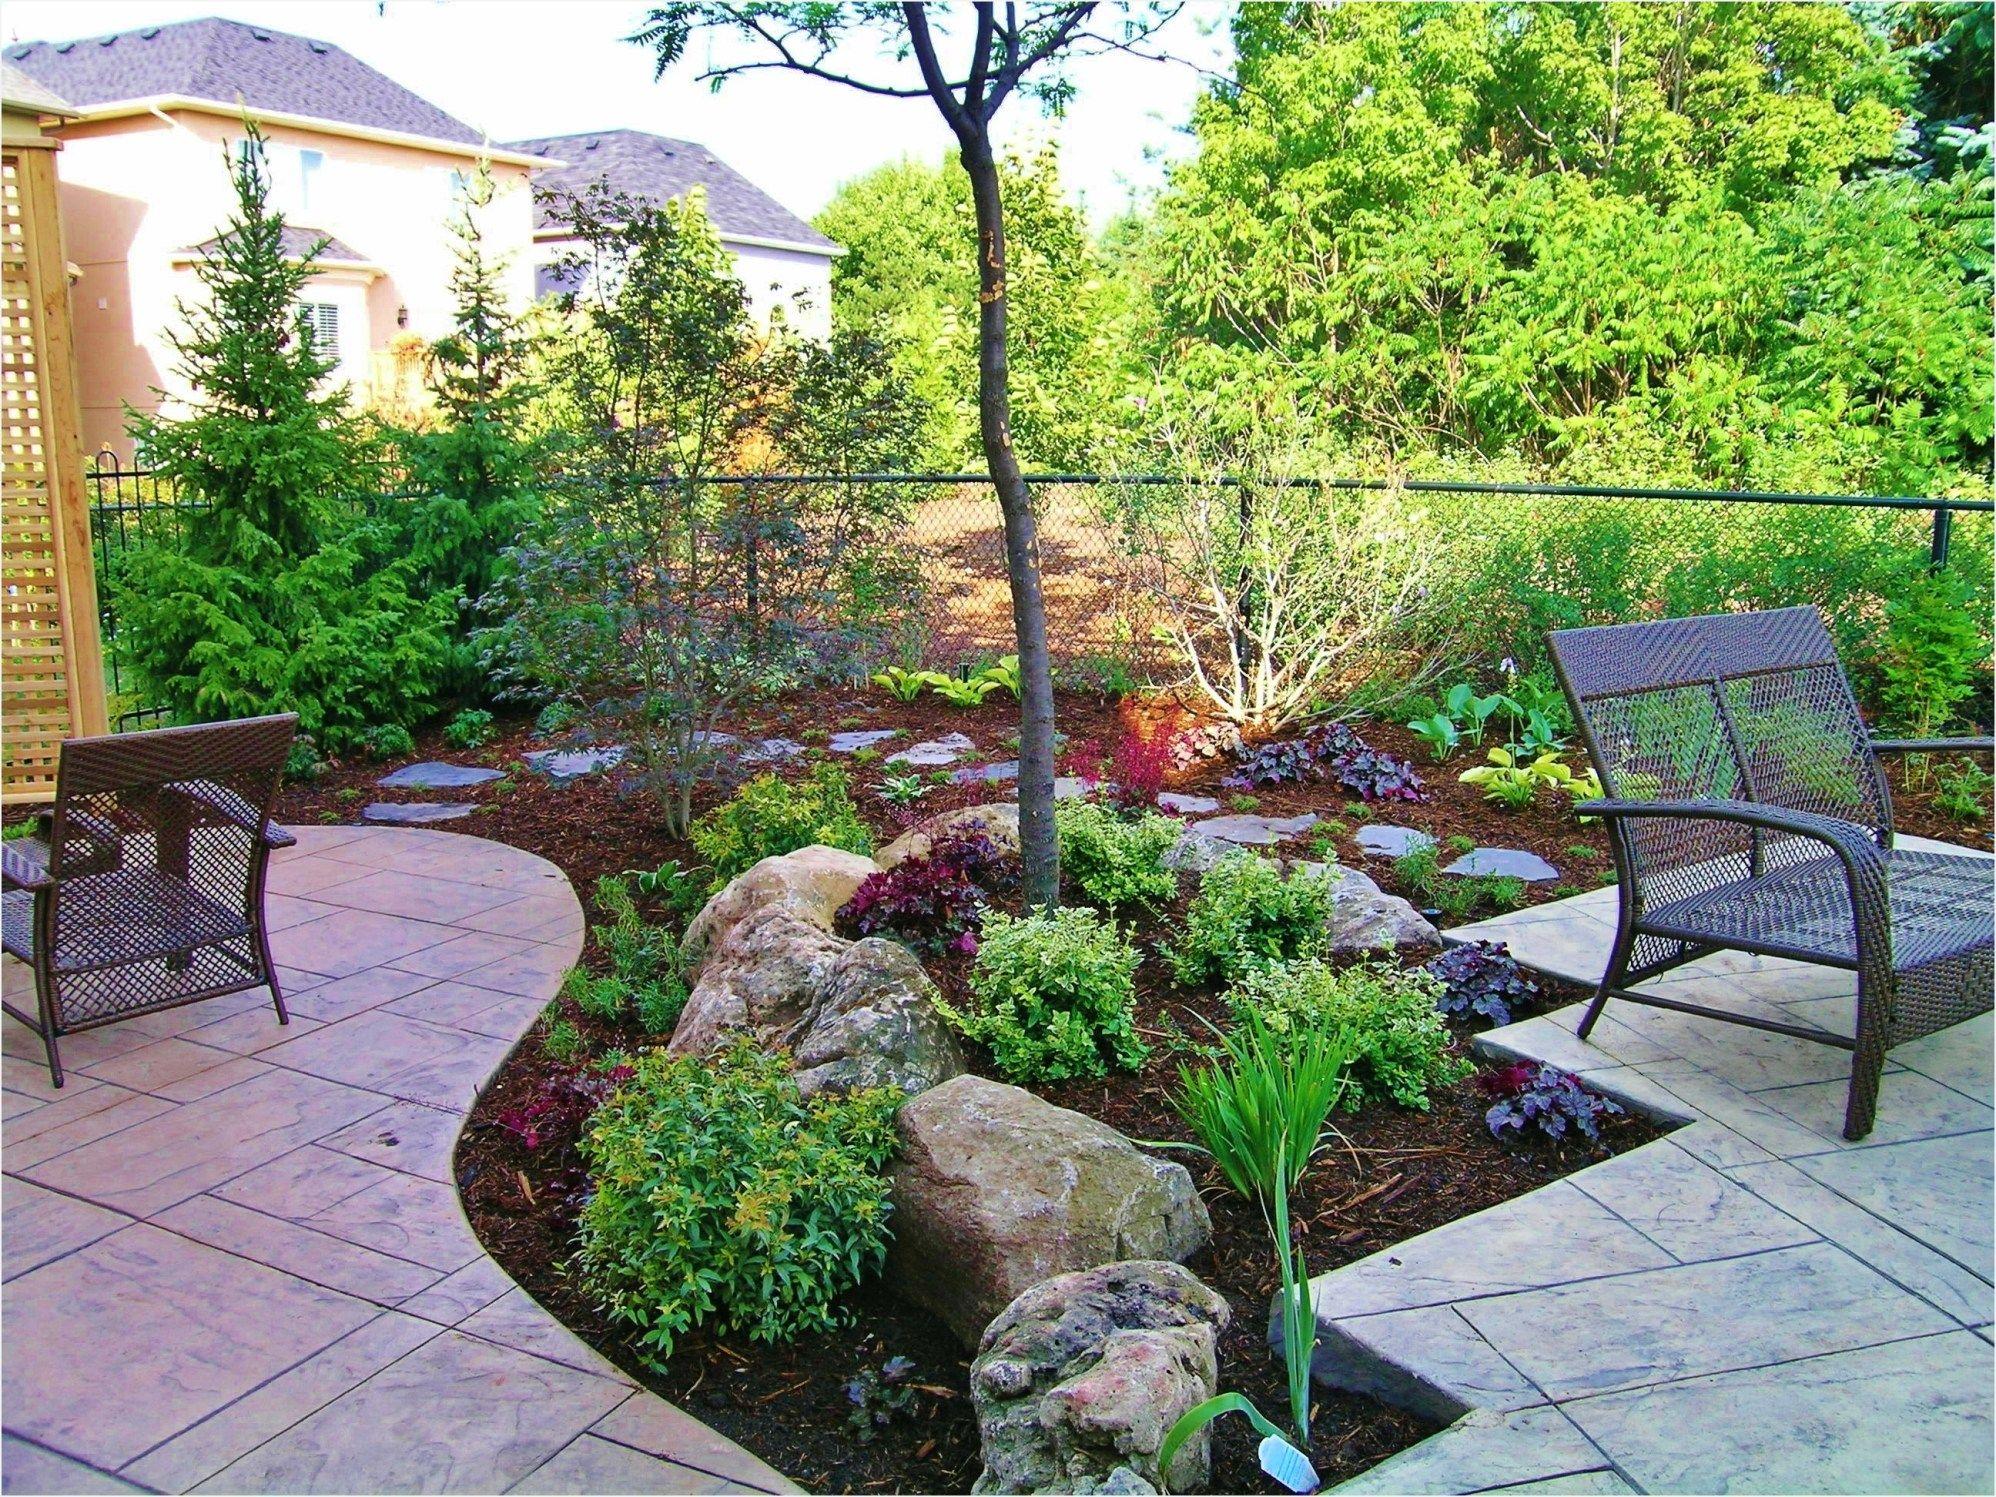 40 Perfect Backyard Landscape Ideas without Grass 77 301 ...